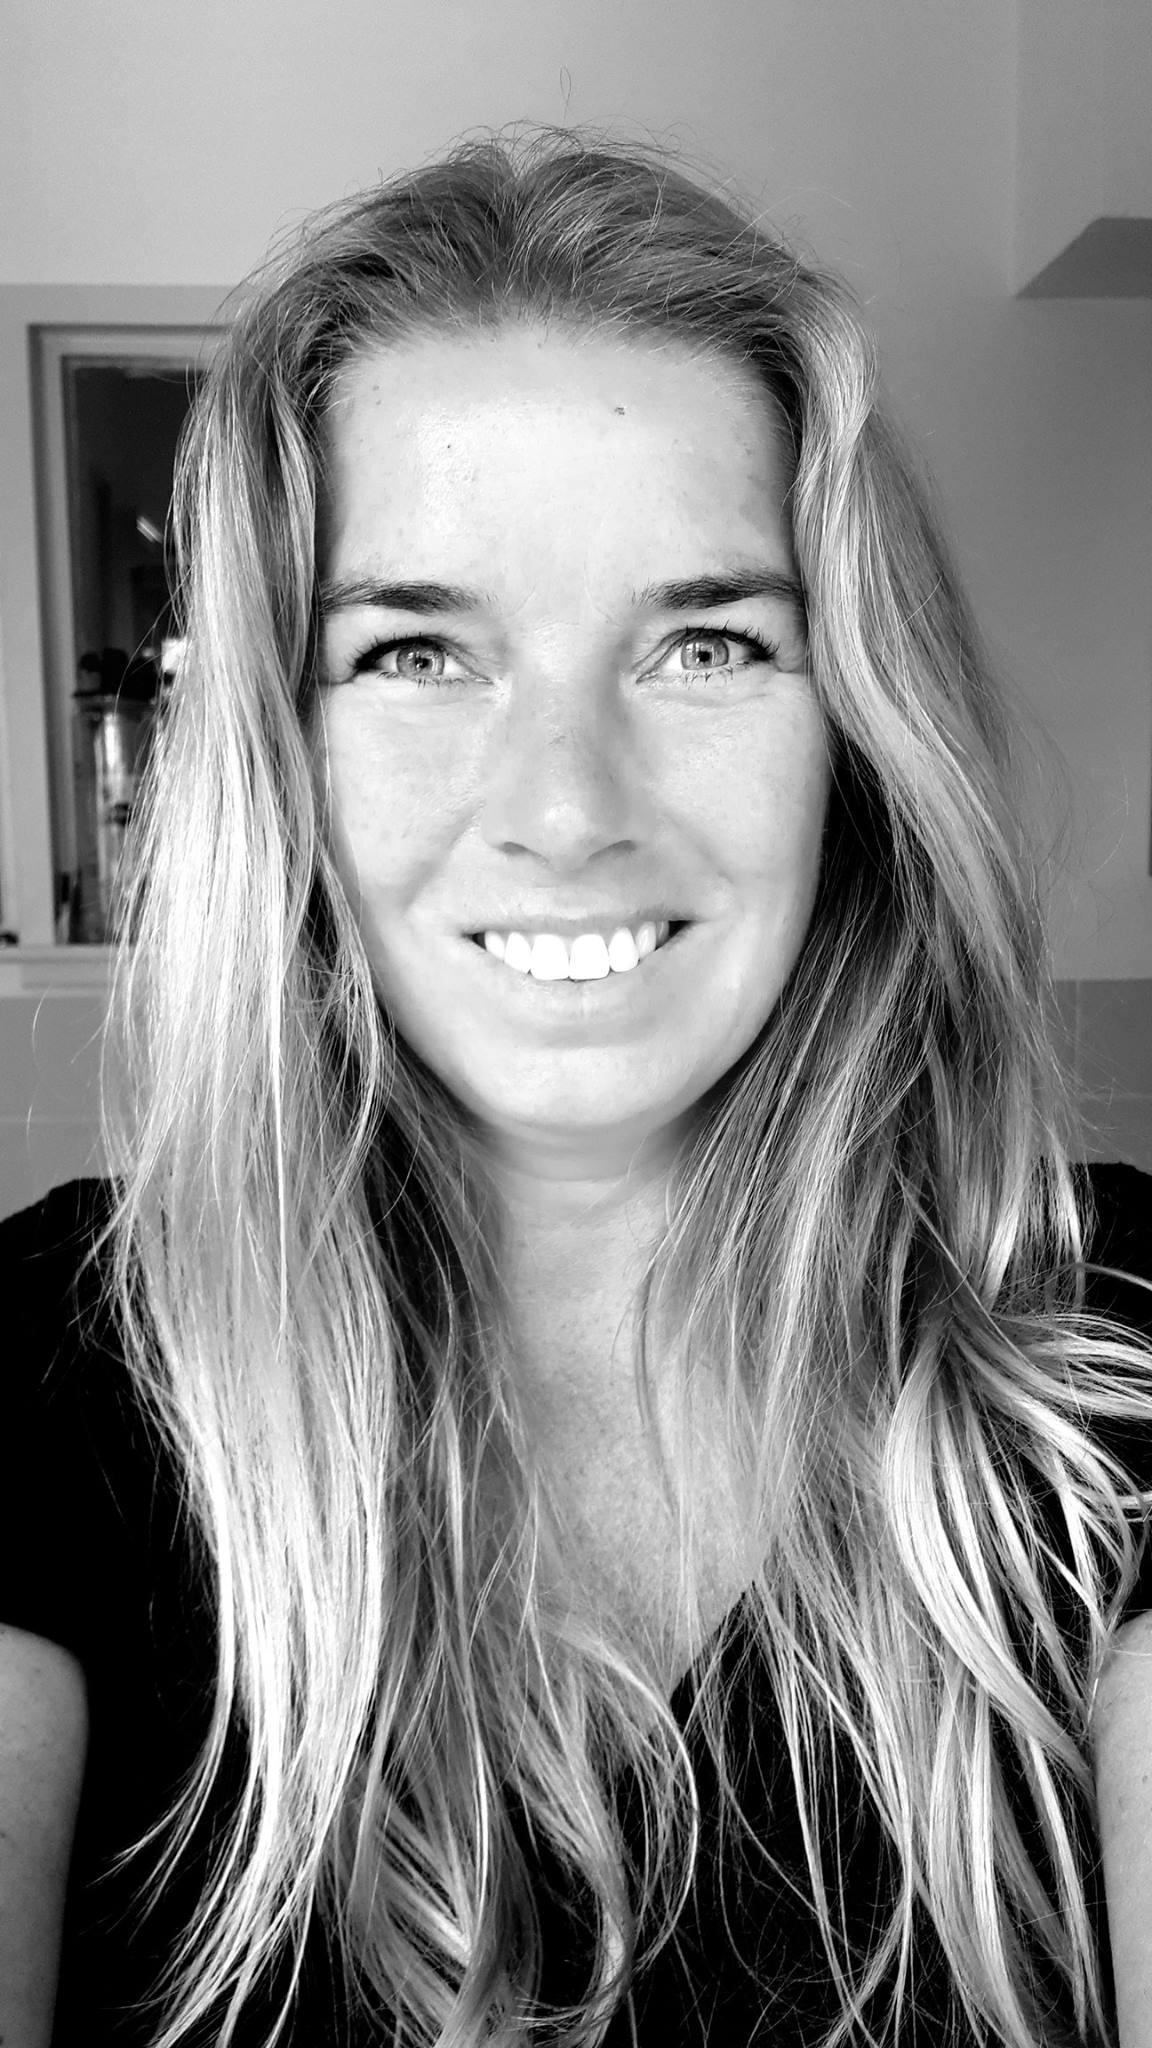 Helen de Jong